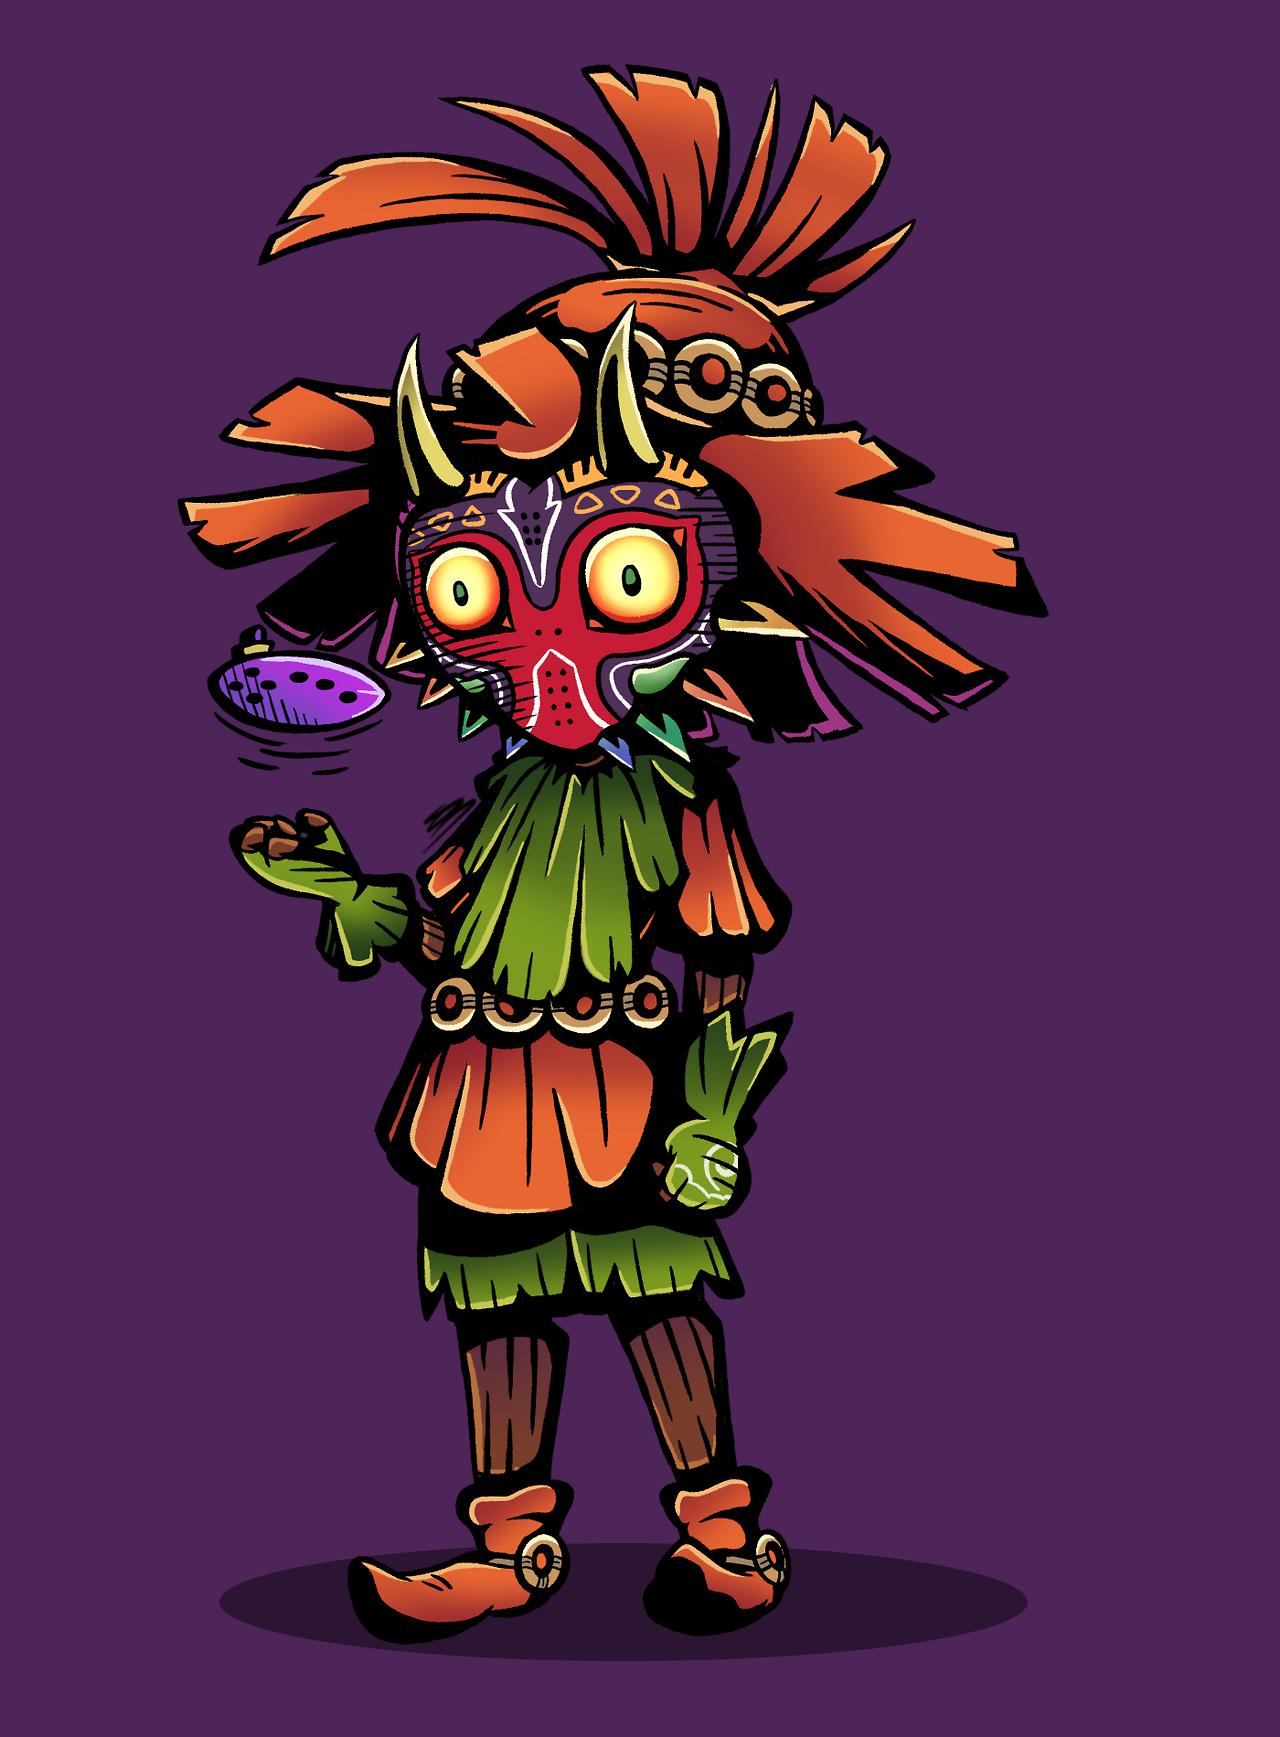 A Spooky Skull Kid Because Halloween Totally Wasn T A Few Months Ago Zelda Art Legend Of Zelda Majoras Mask Skull Kid